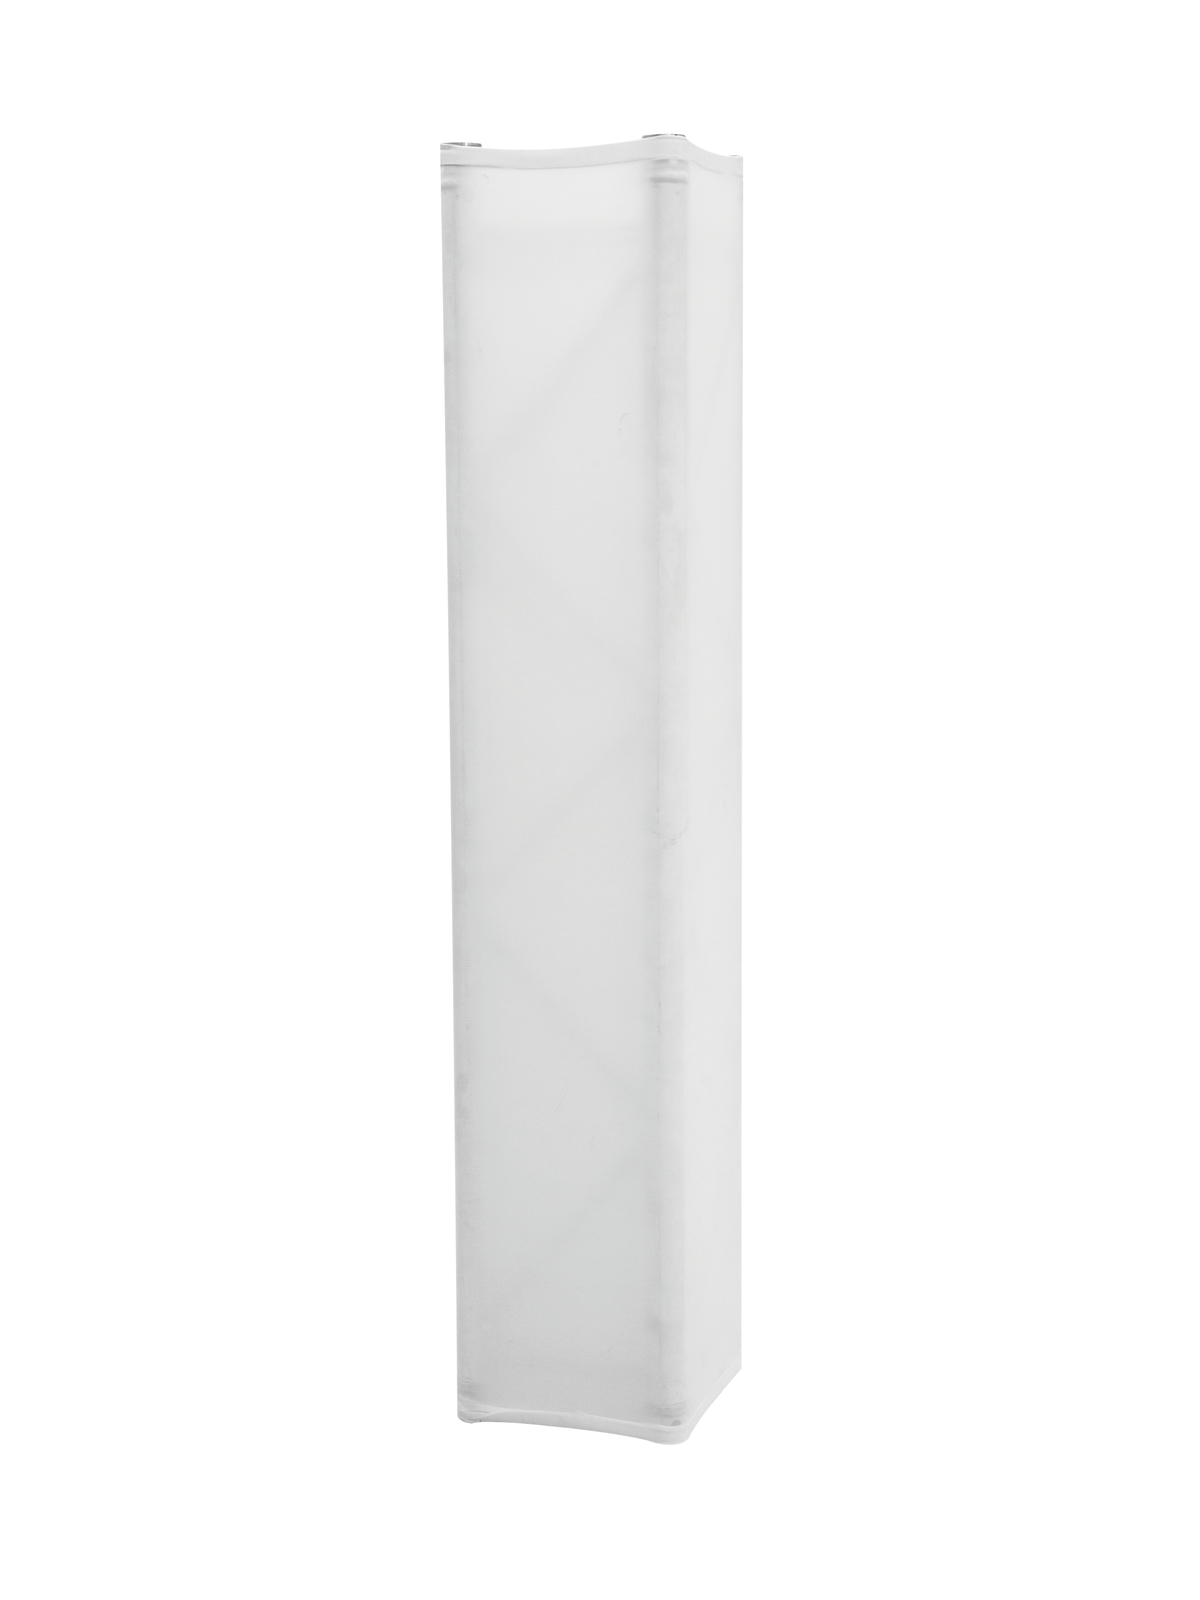 Kryt elastický pro konstrukci 250cm, bílý